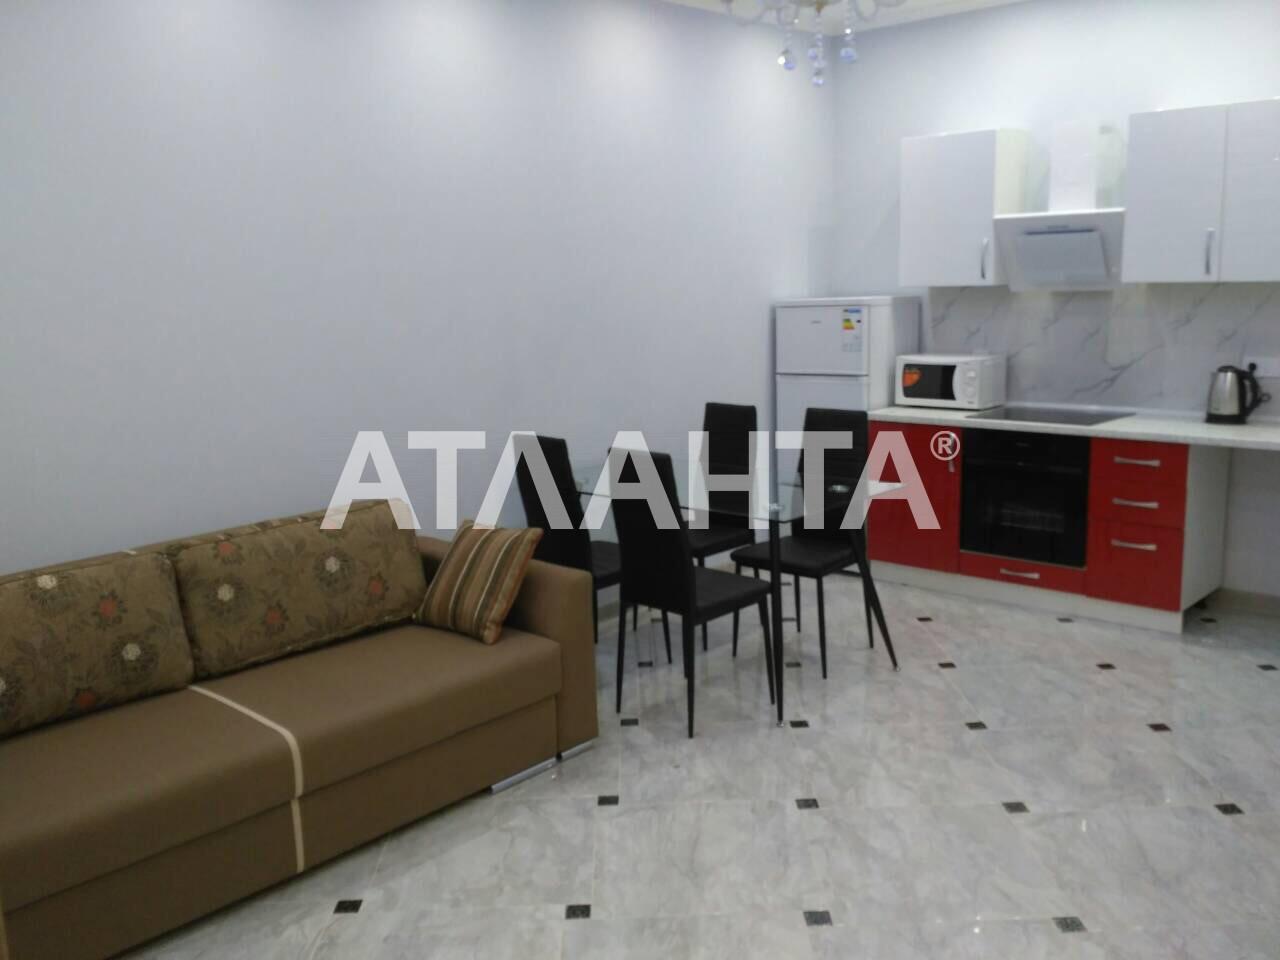 Продается 2-комнатная Квартира на ул. Кондратюка,3 — 65 000 у.е. (фото №6)